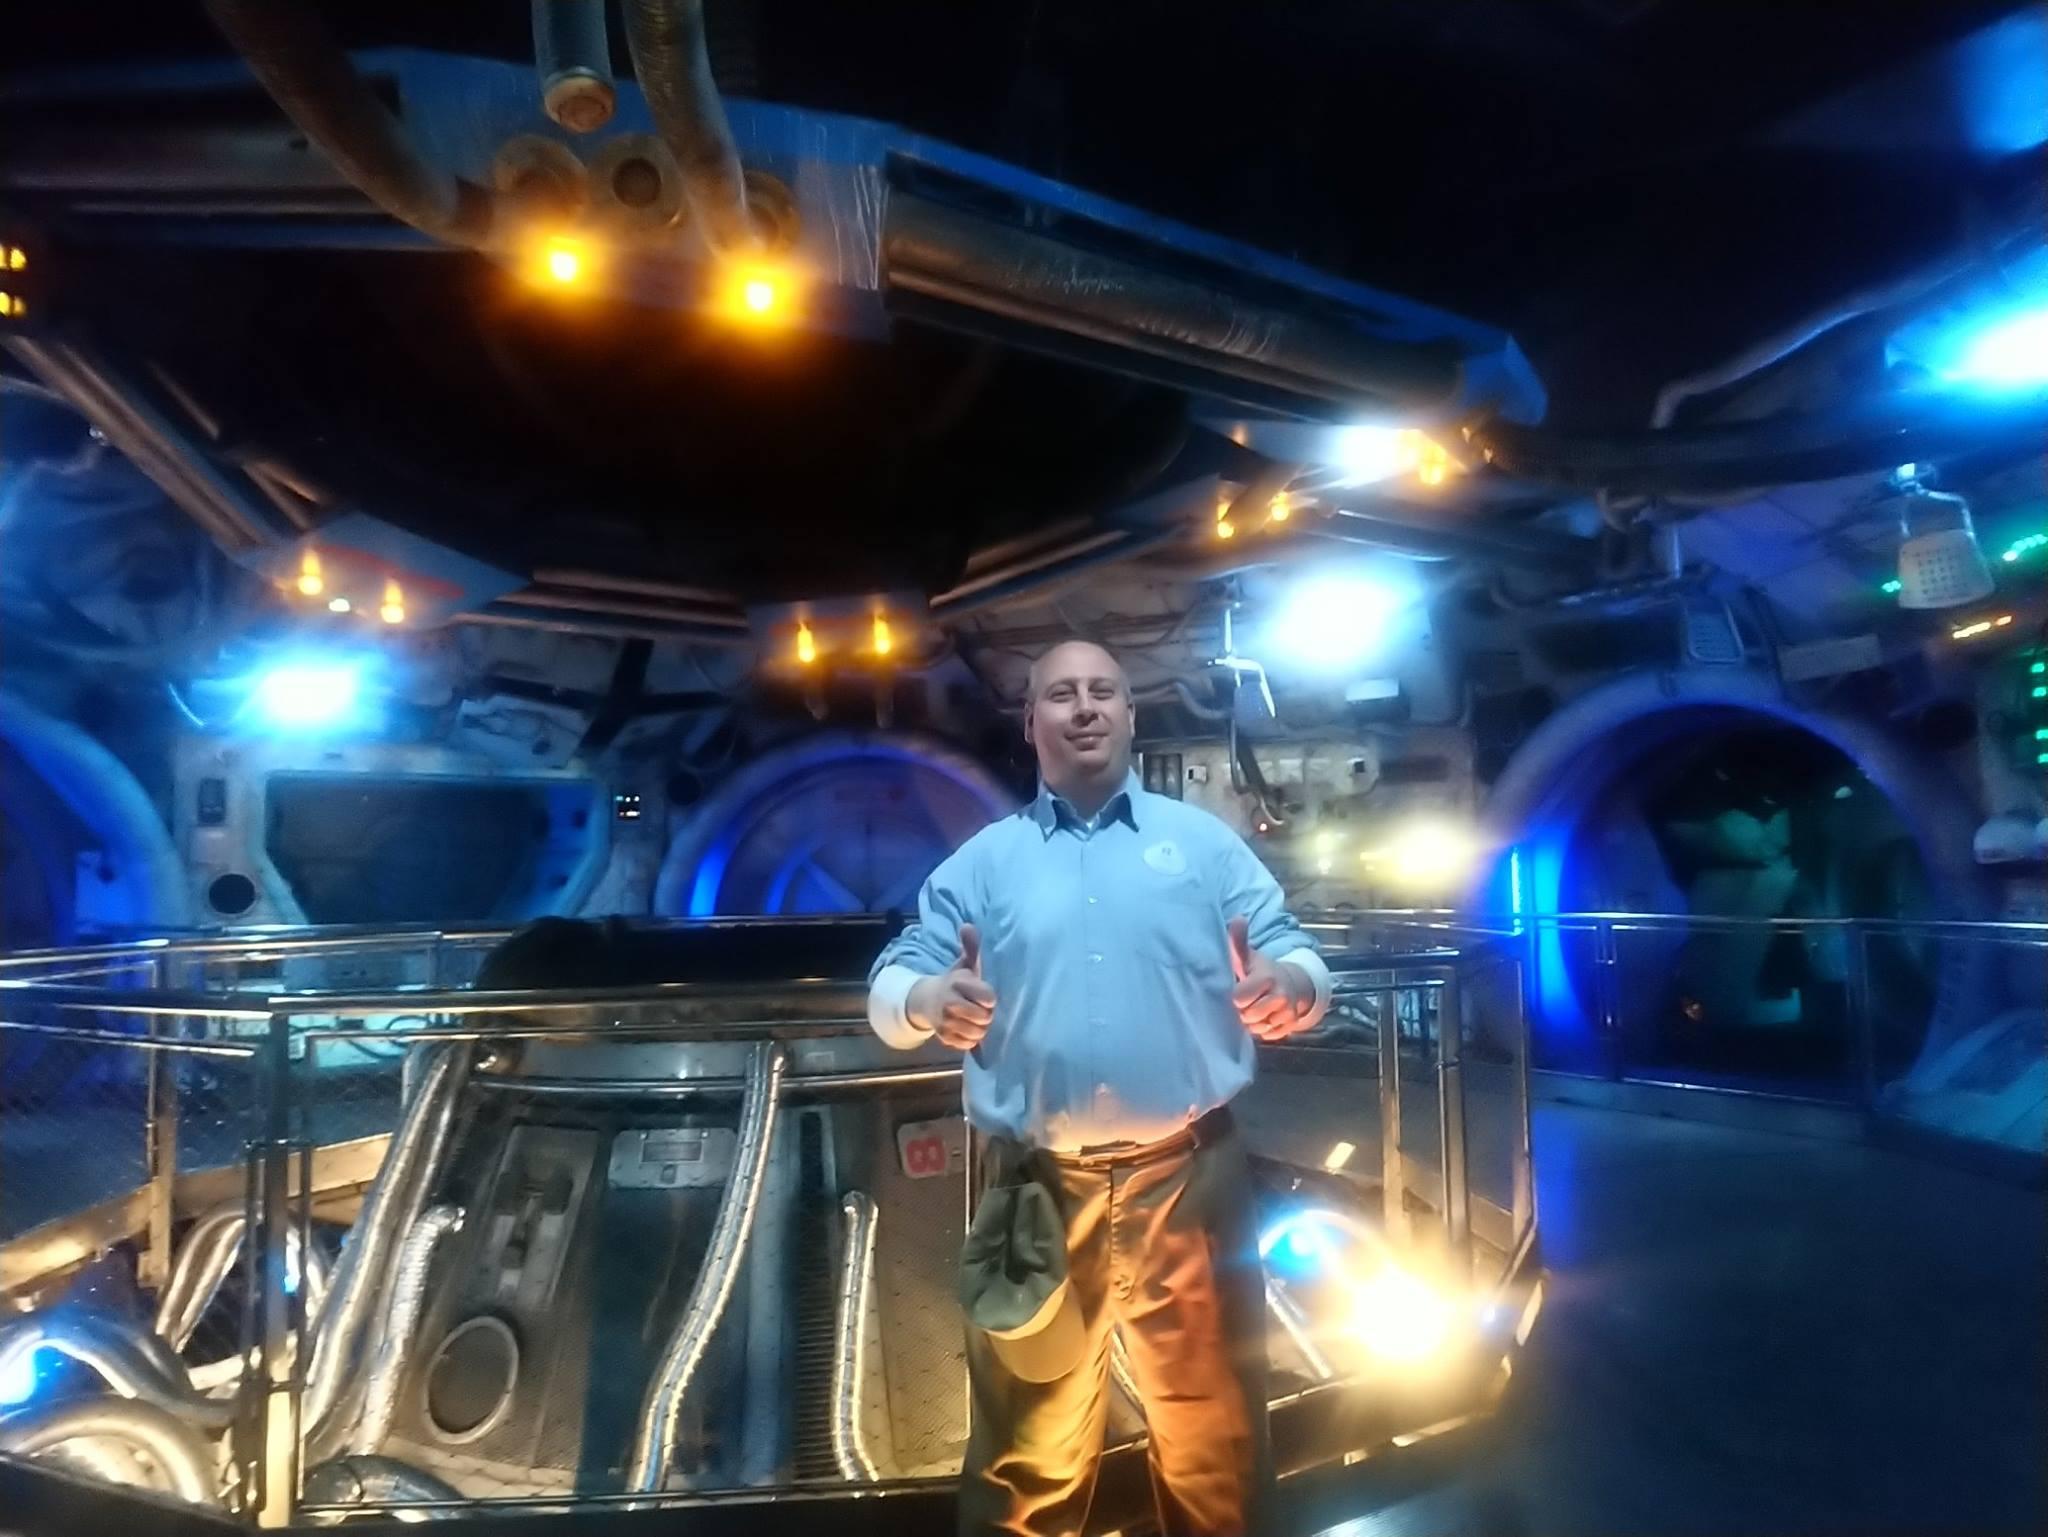 Armageddon à Walt Disney Studios - Cédric, cast member